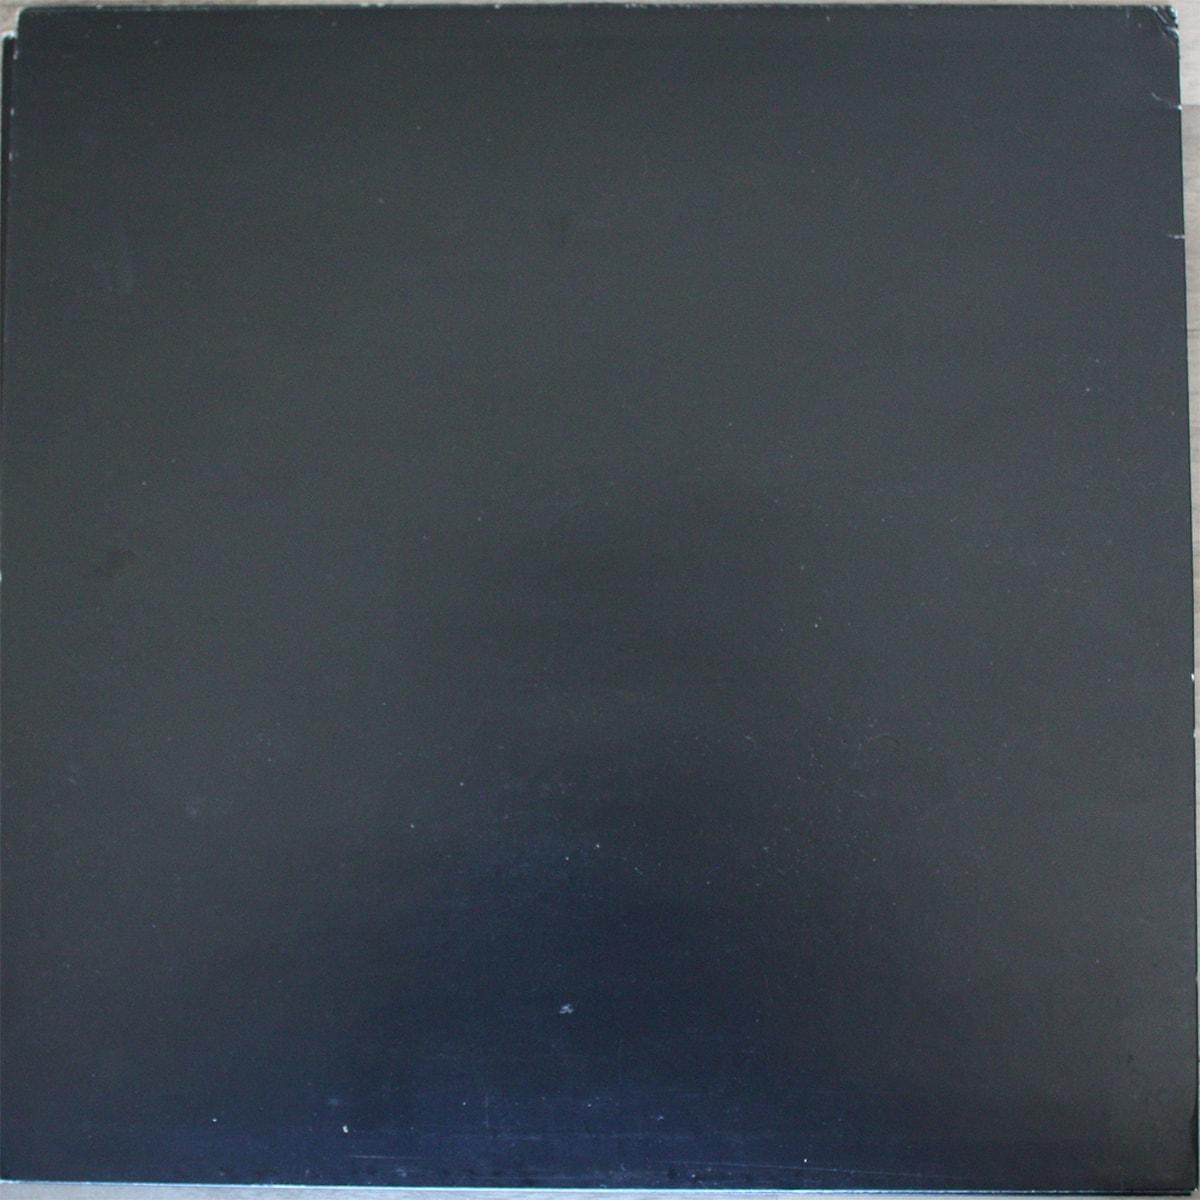 Splendor Solis - First Vinyl pressing